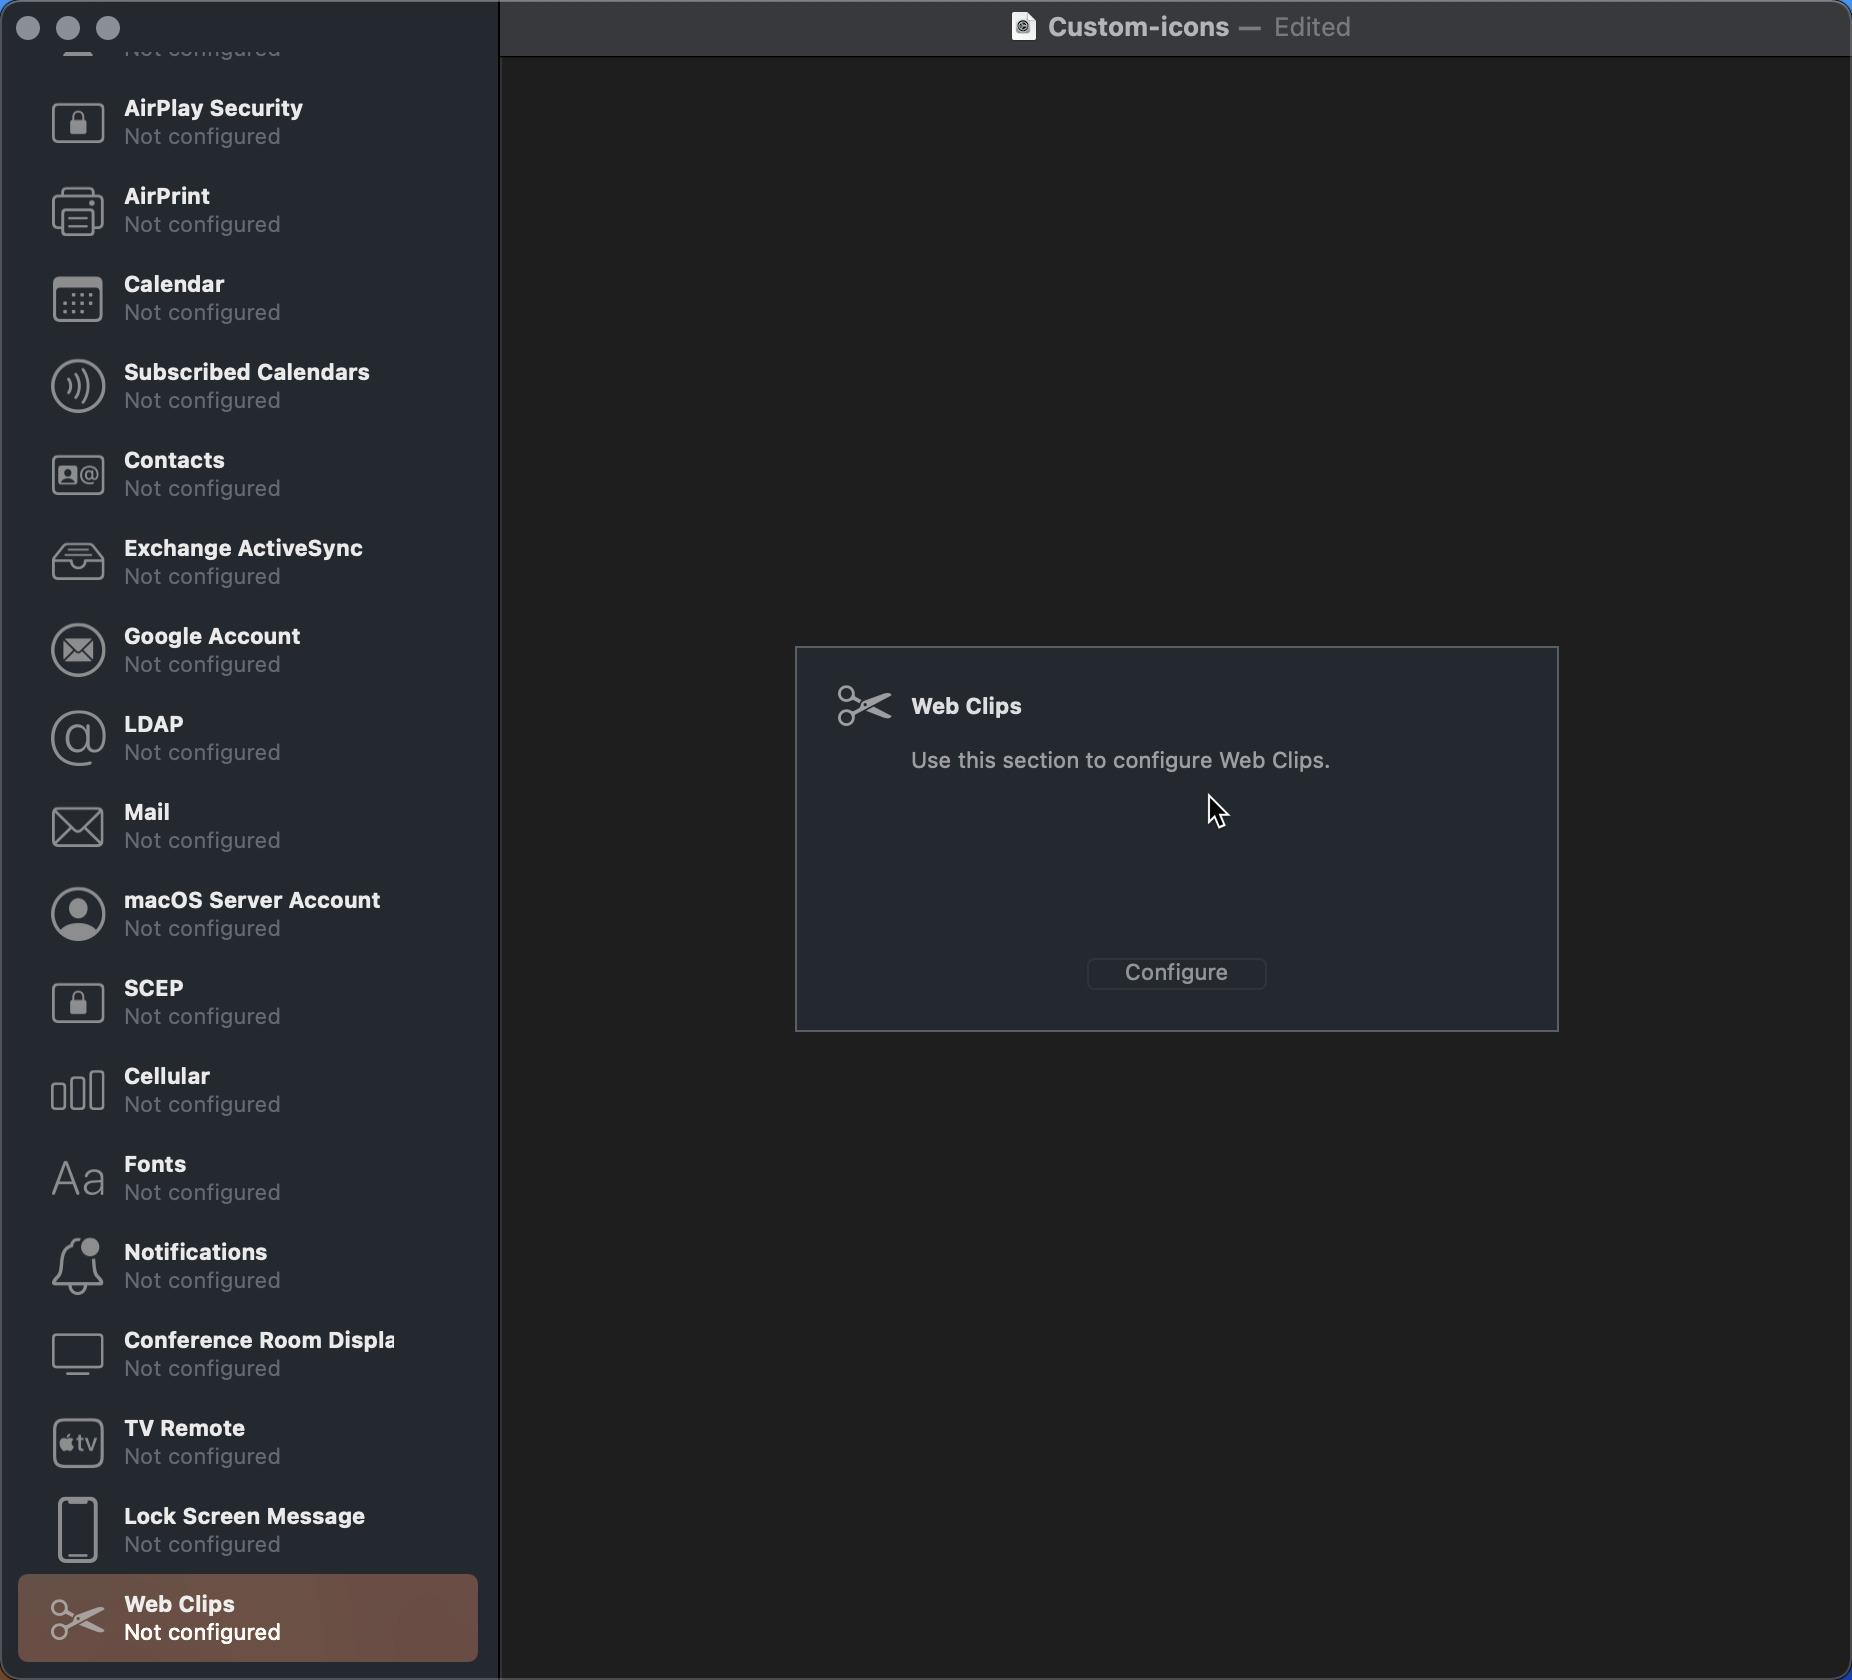 Web clips configuration on Apple Configurator